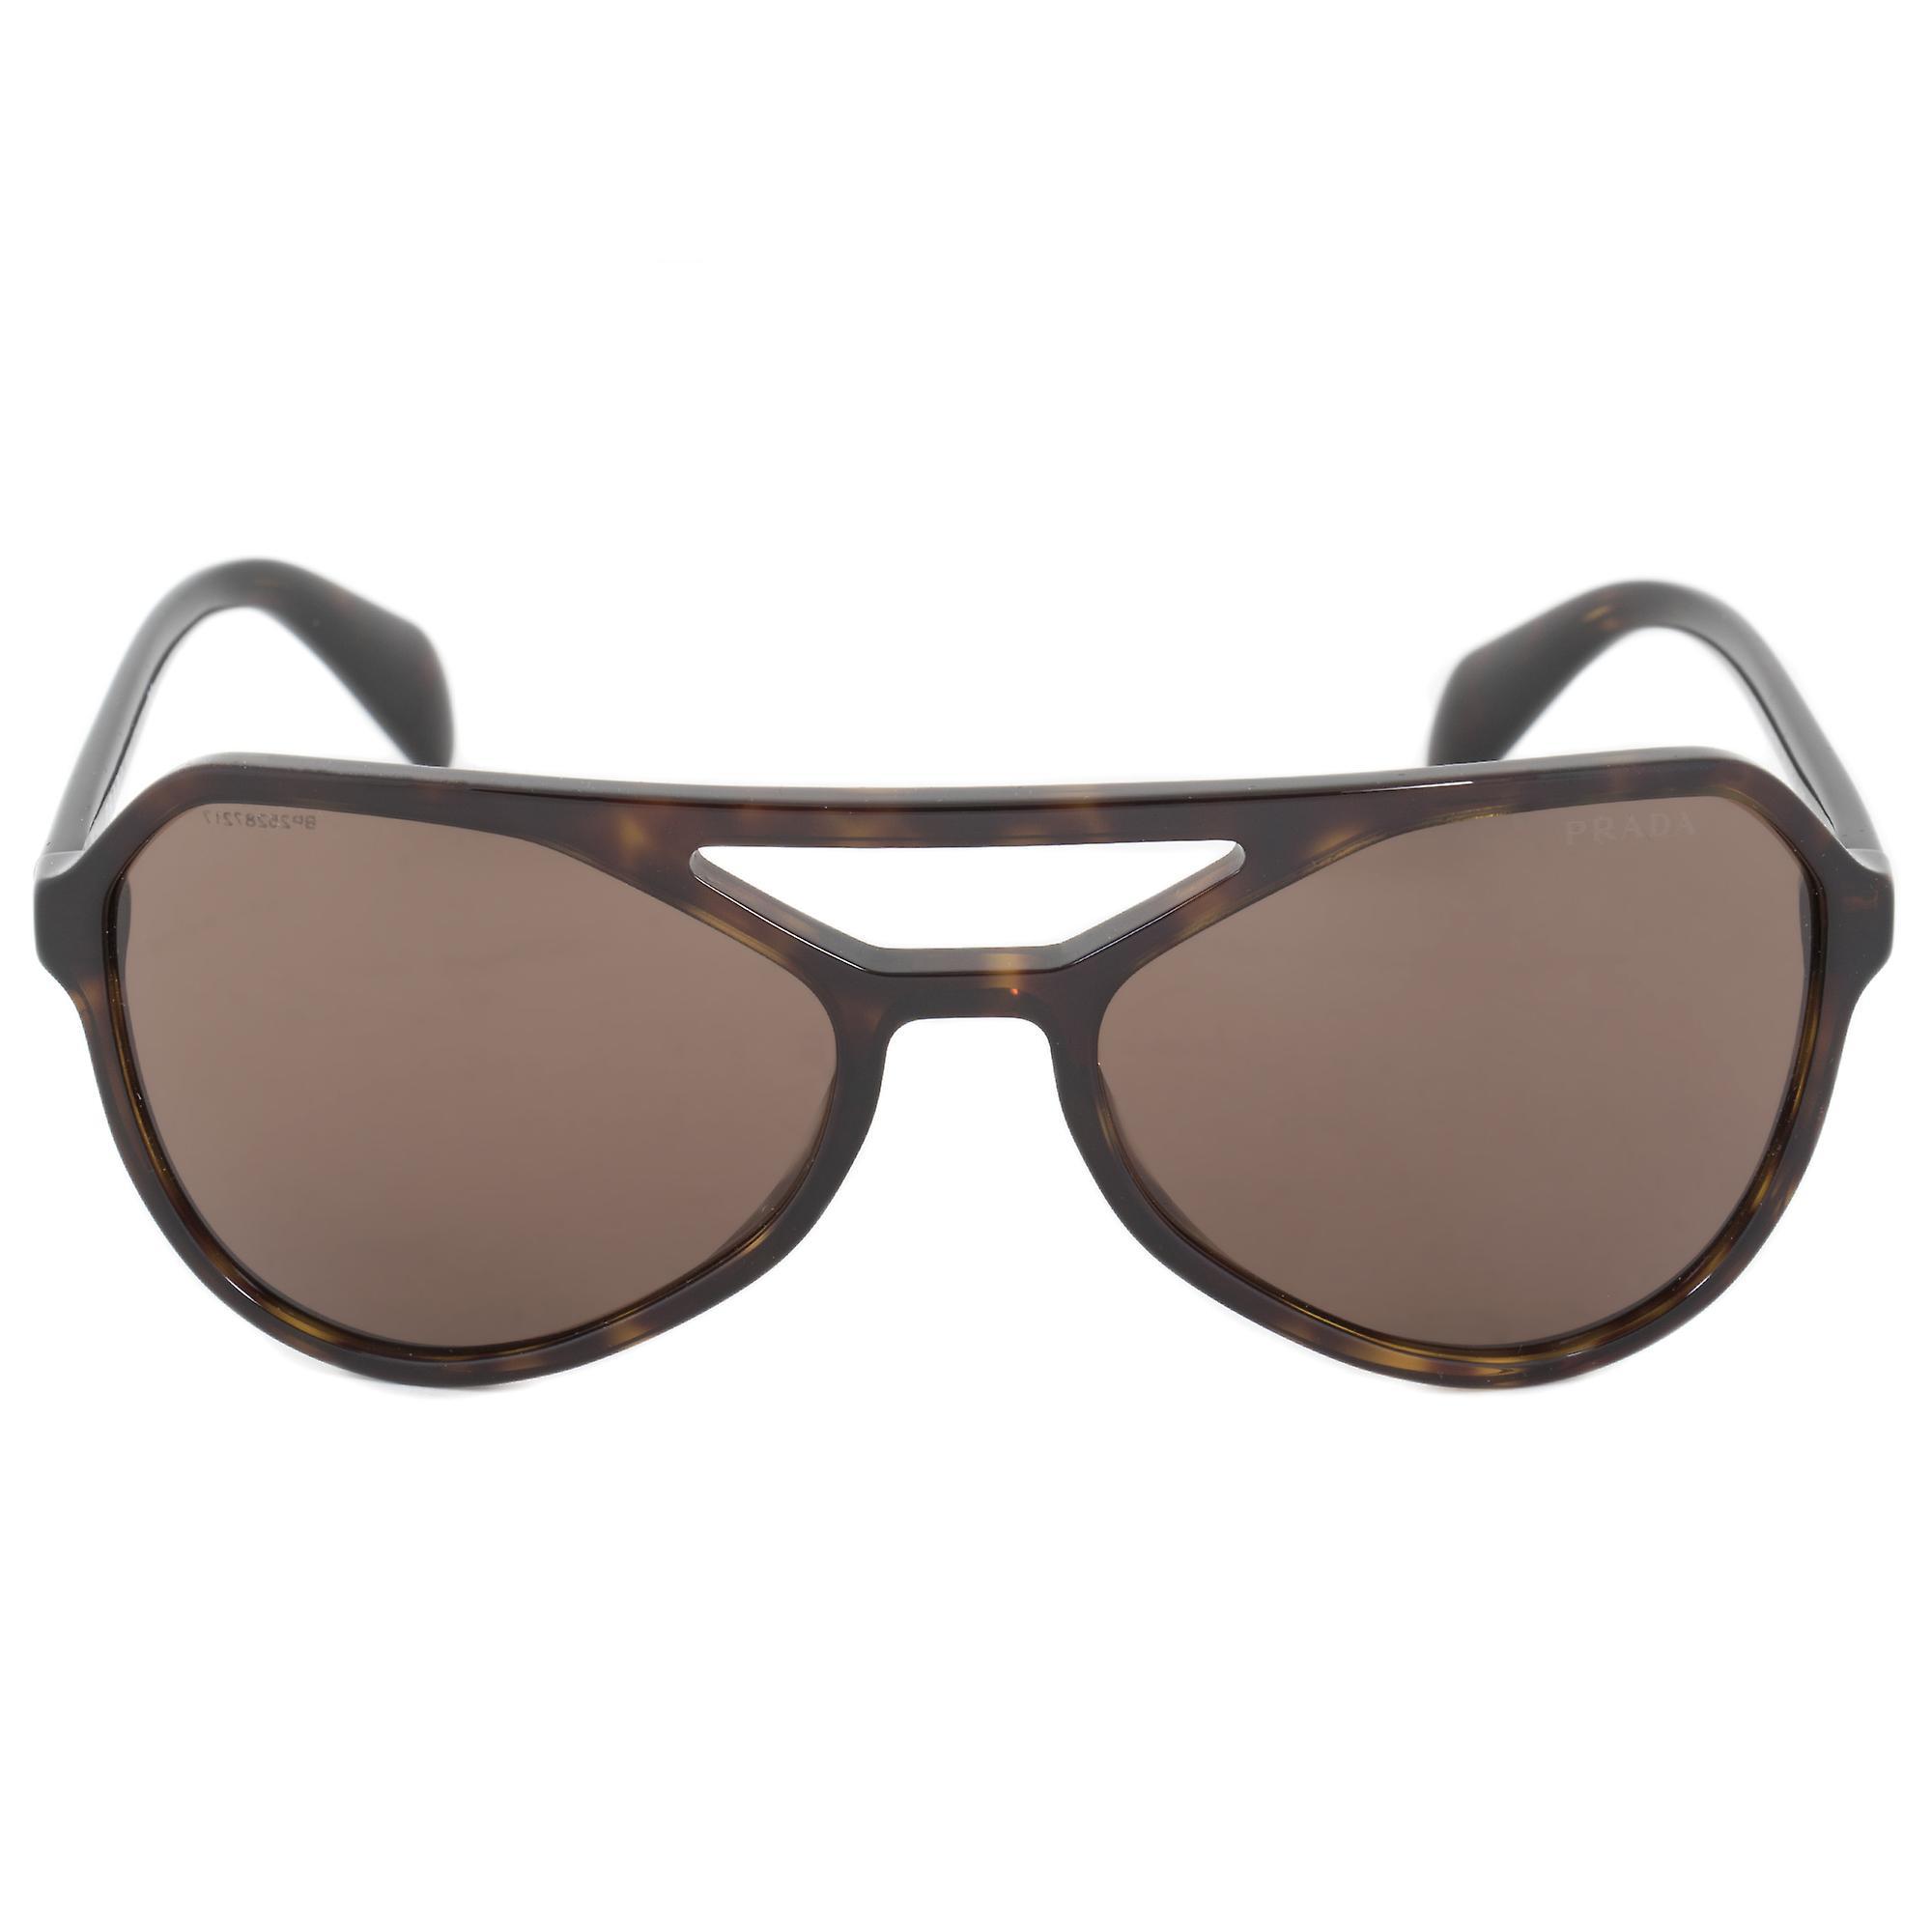 Prada Sunglasses PR22RS 2AU8C1 58   Dark Havana Frame   Brown Lens